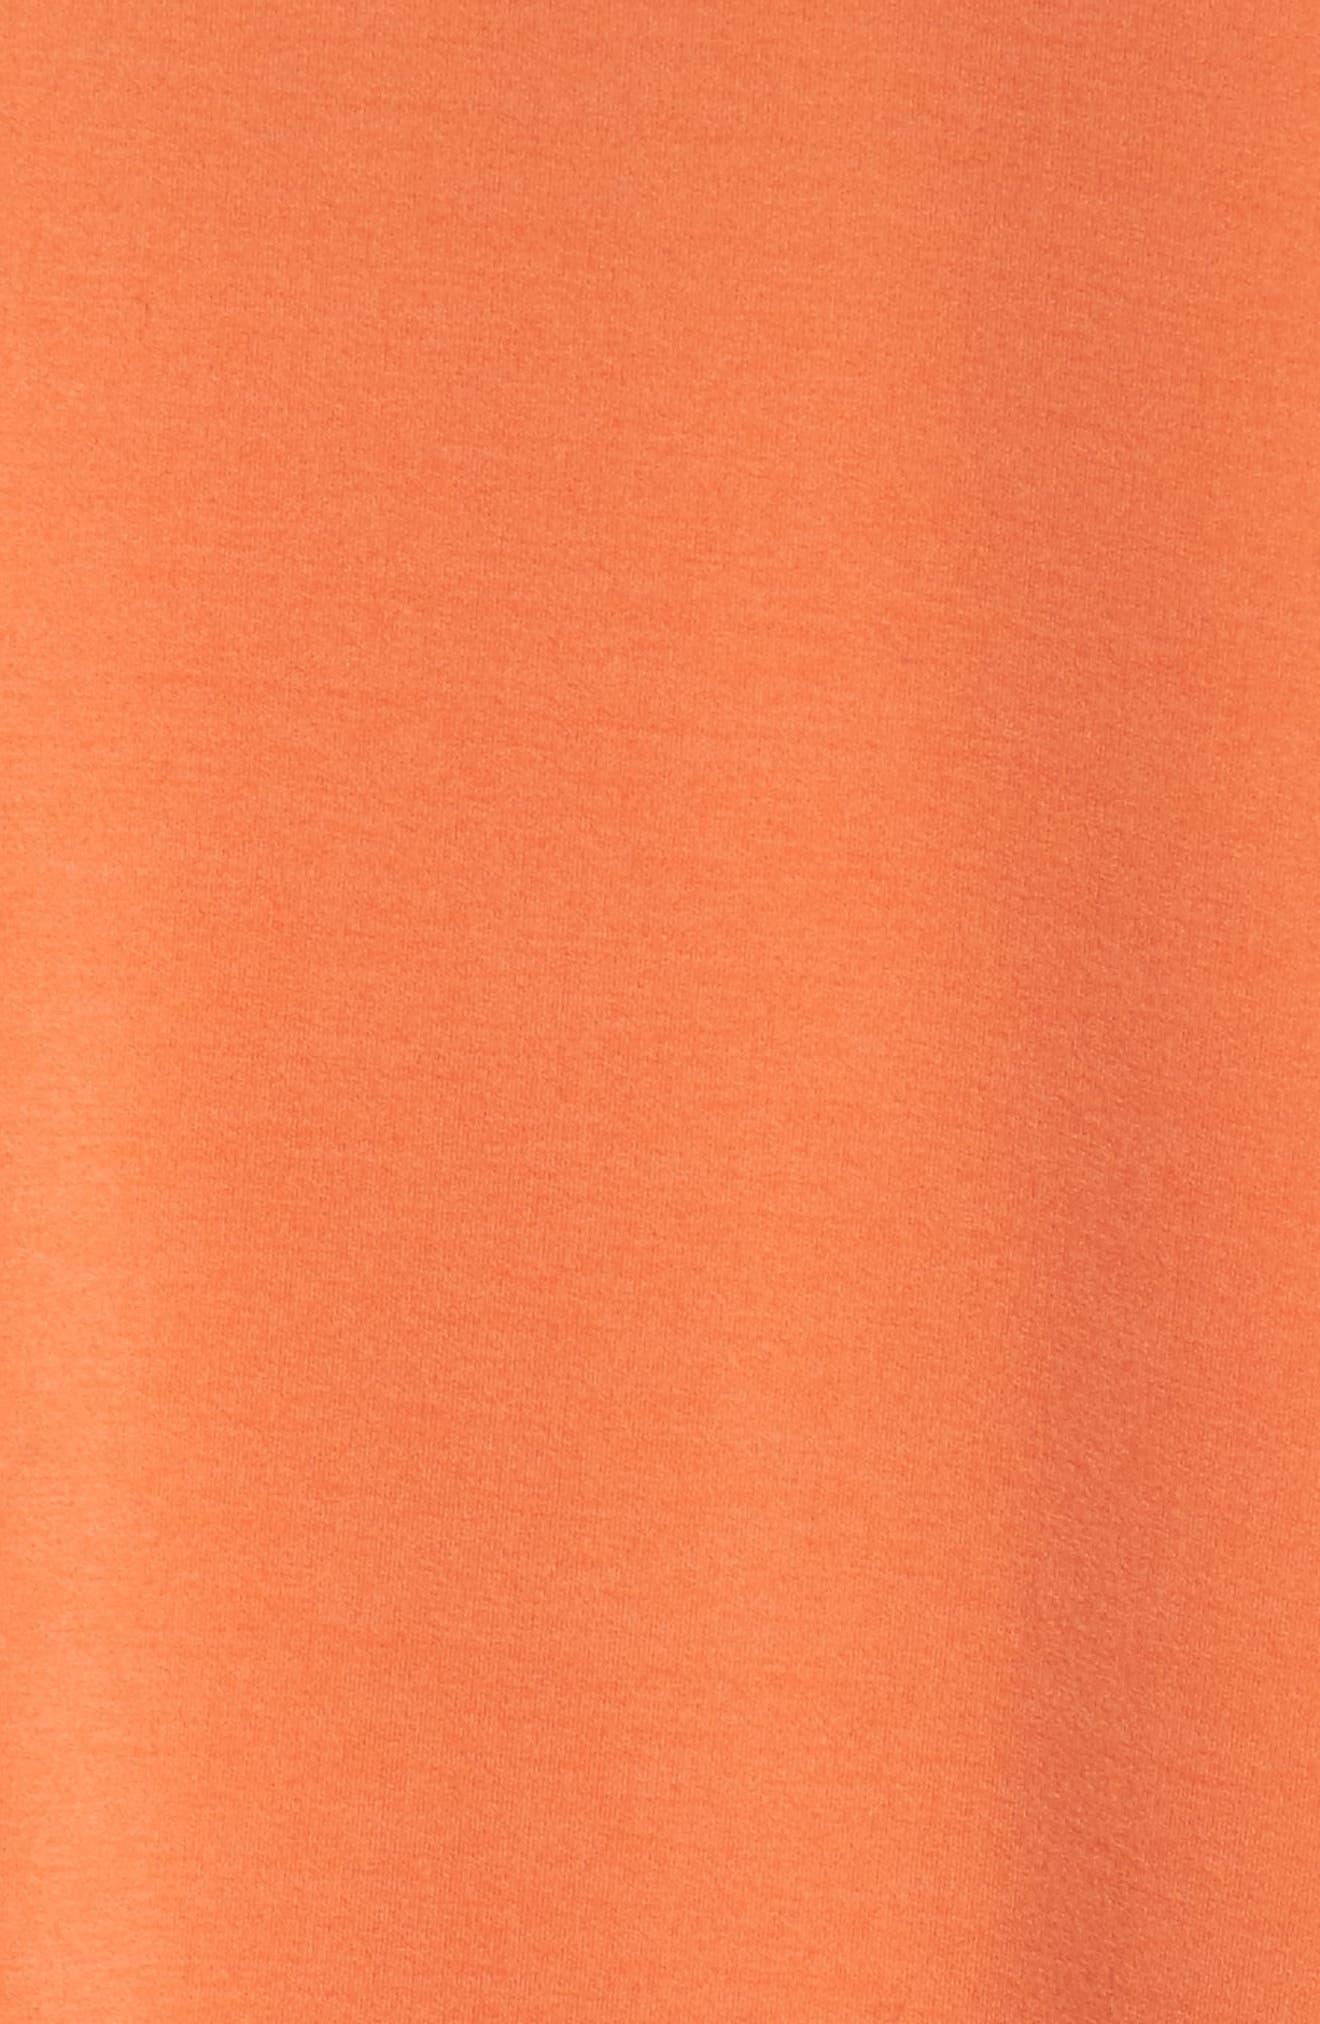 Pump It Up Tank,                             Alternate thumbnail 6, color,                             Orange Blossom